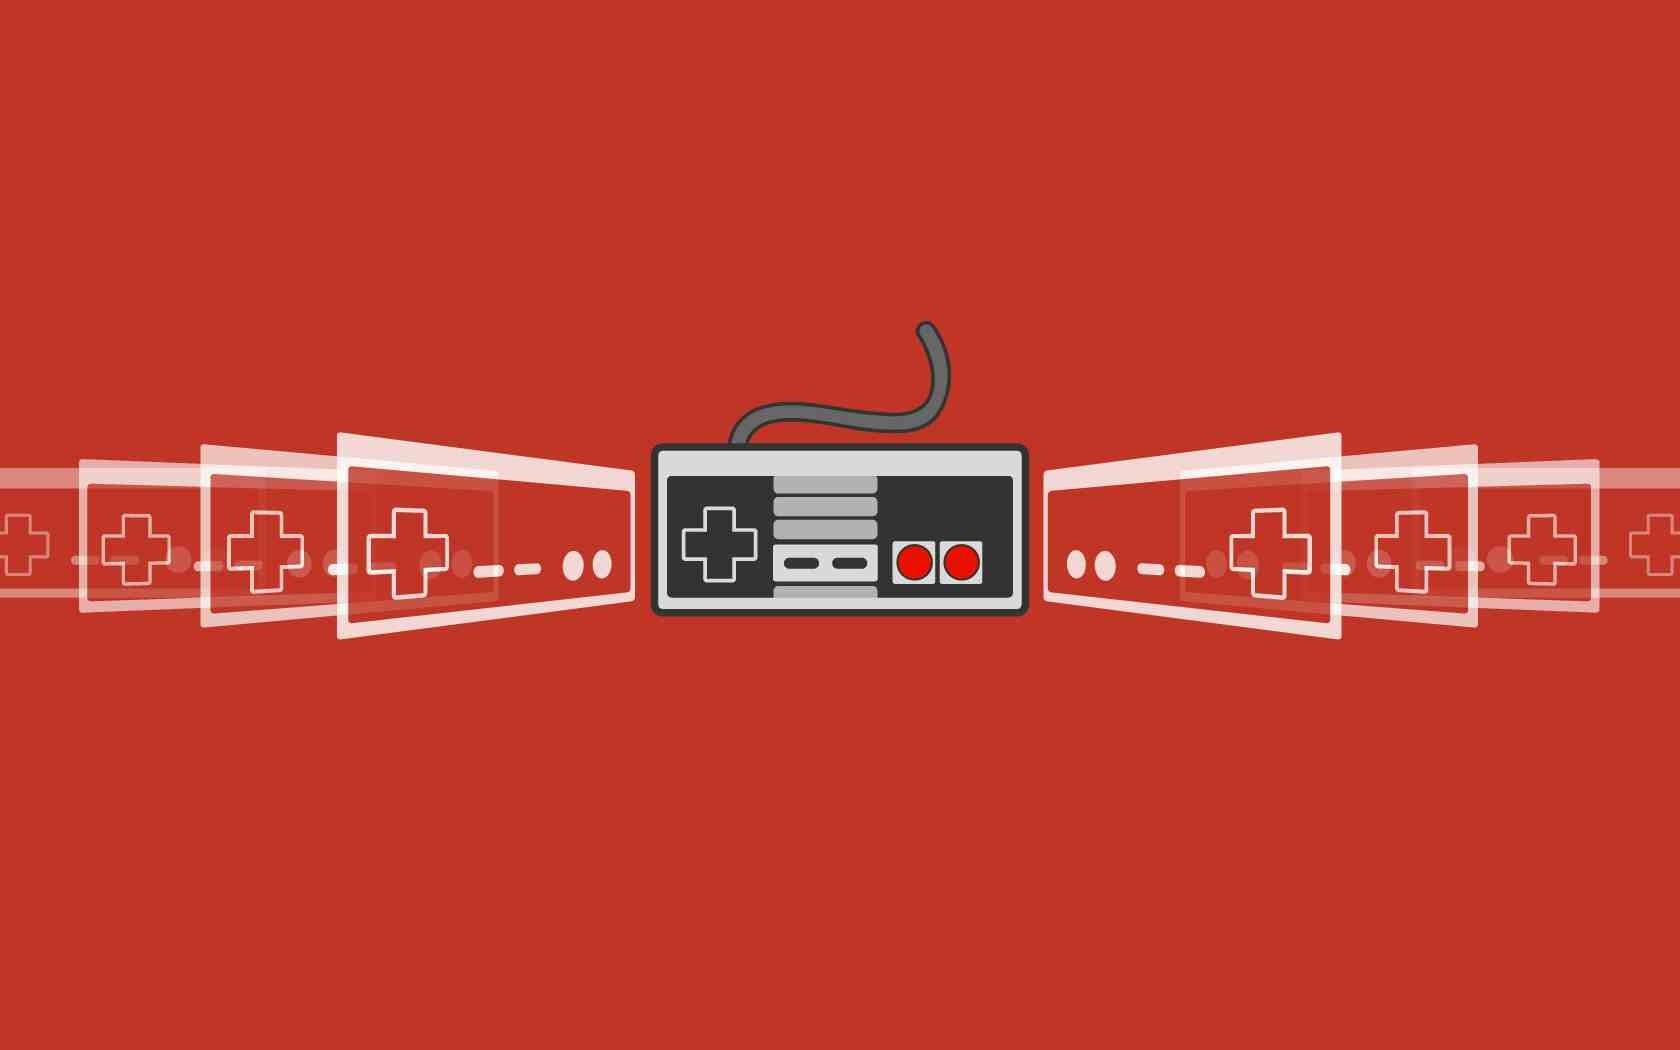 ilustração videogames minimalismo texto logotipo Controladores Jogos retro  Marca Sistema de Entretenimento Nintendo Fonte diagrama